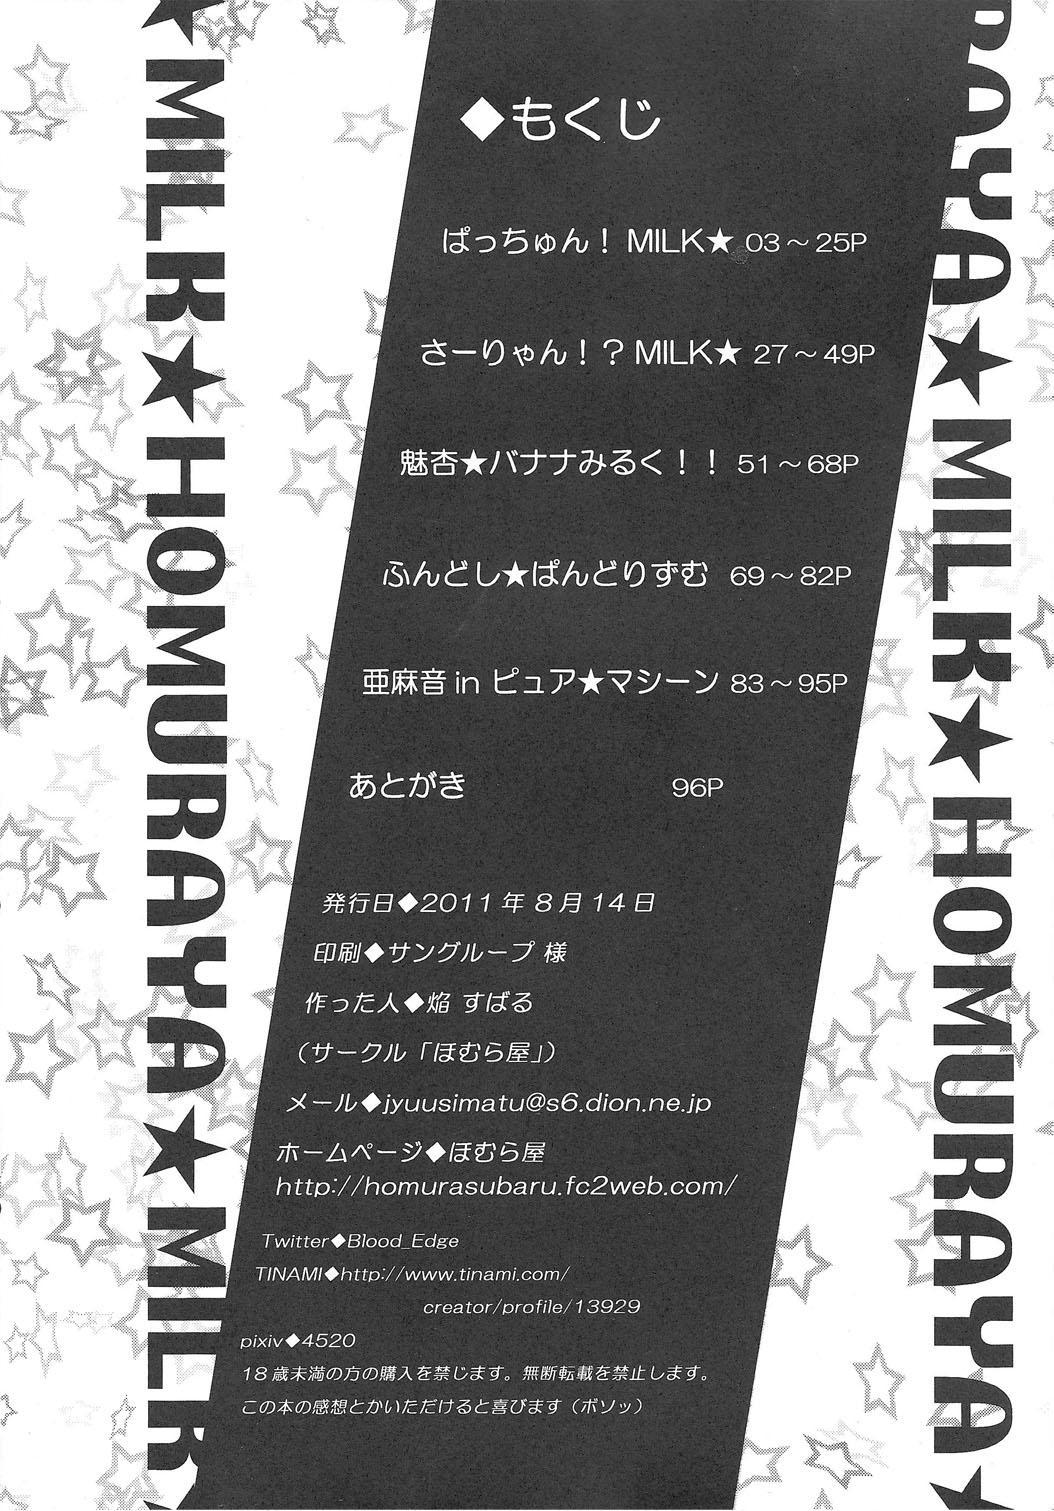 Homuraya Milk ★ Collection 8